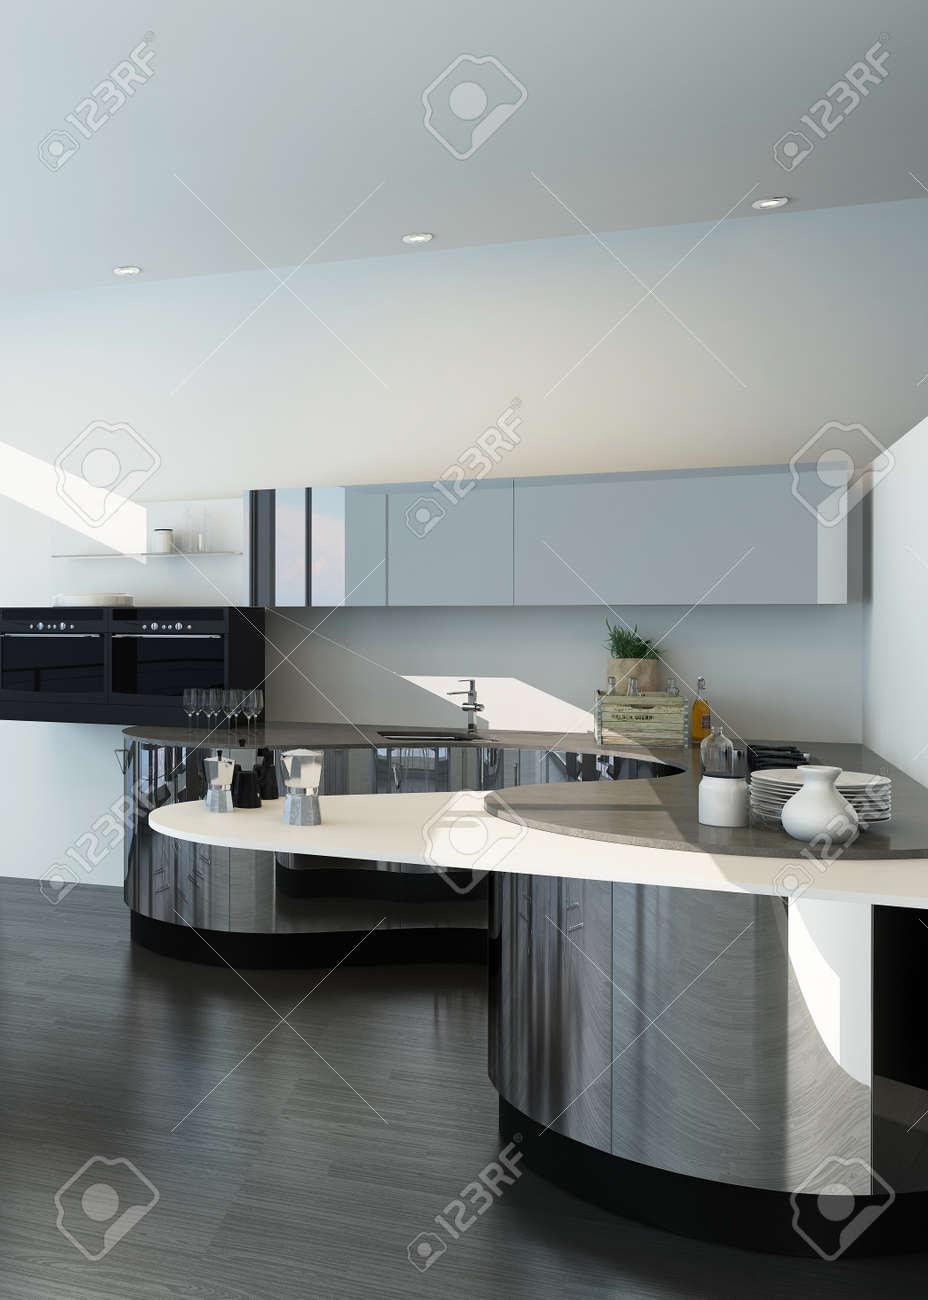 Modern silver and white colored kitchen interior Stock Photo - 29180852